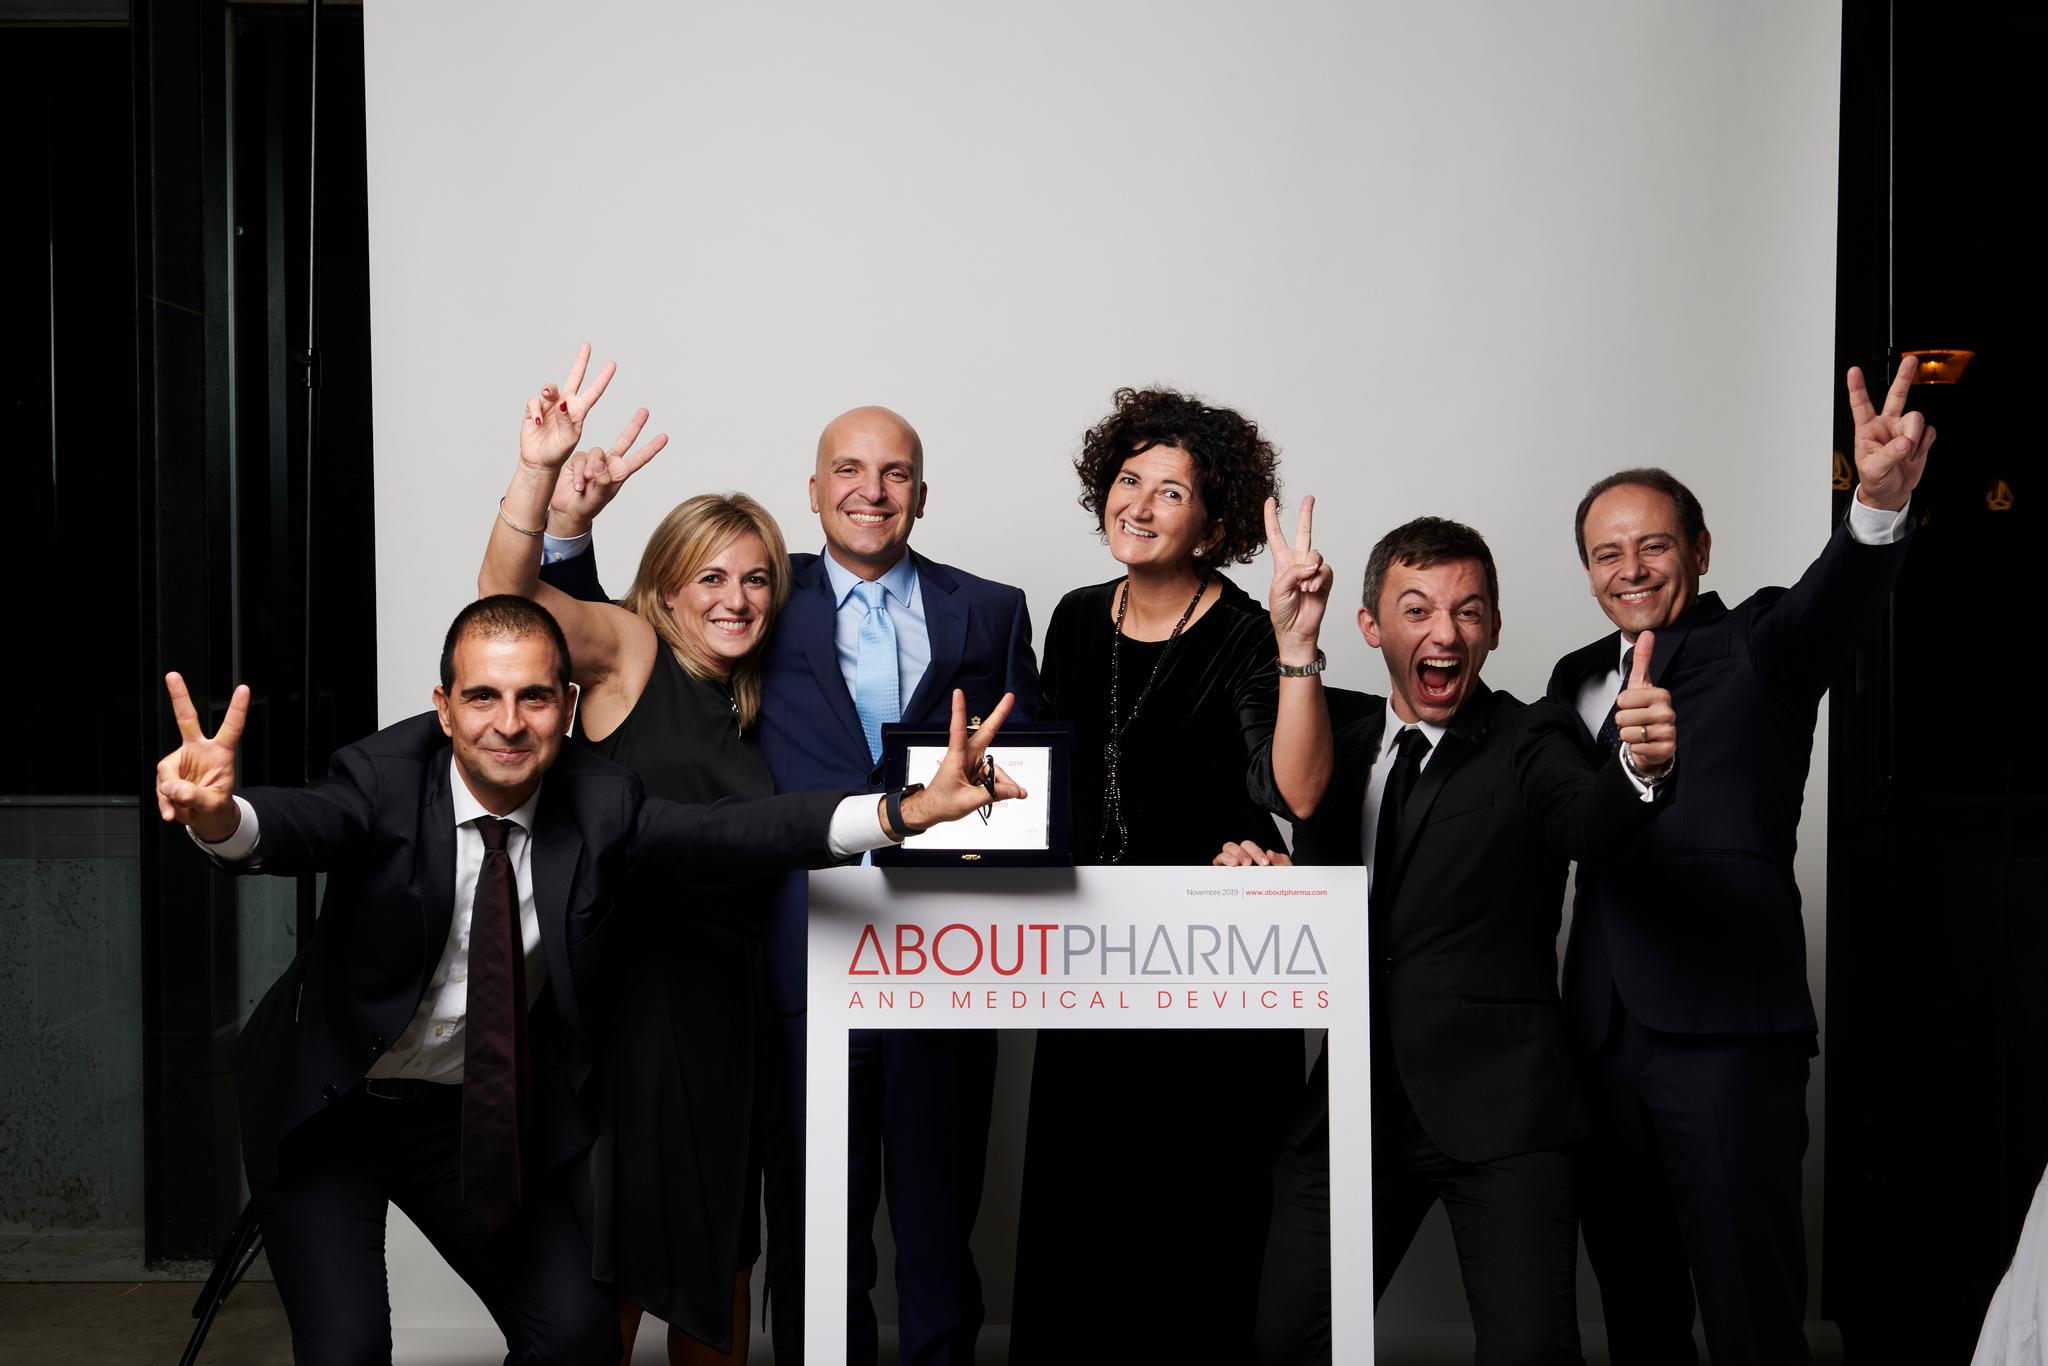 Photobooth AboutPharma Digital Awards 2019_77